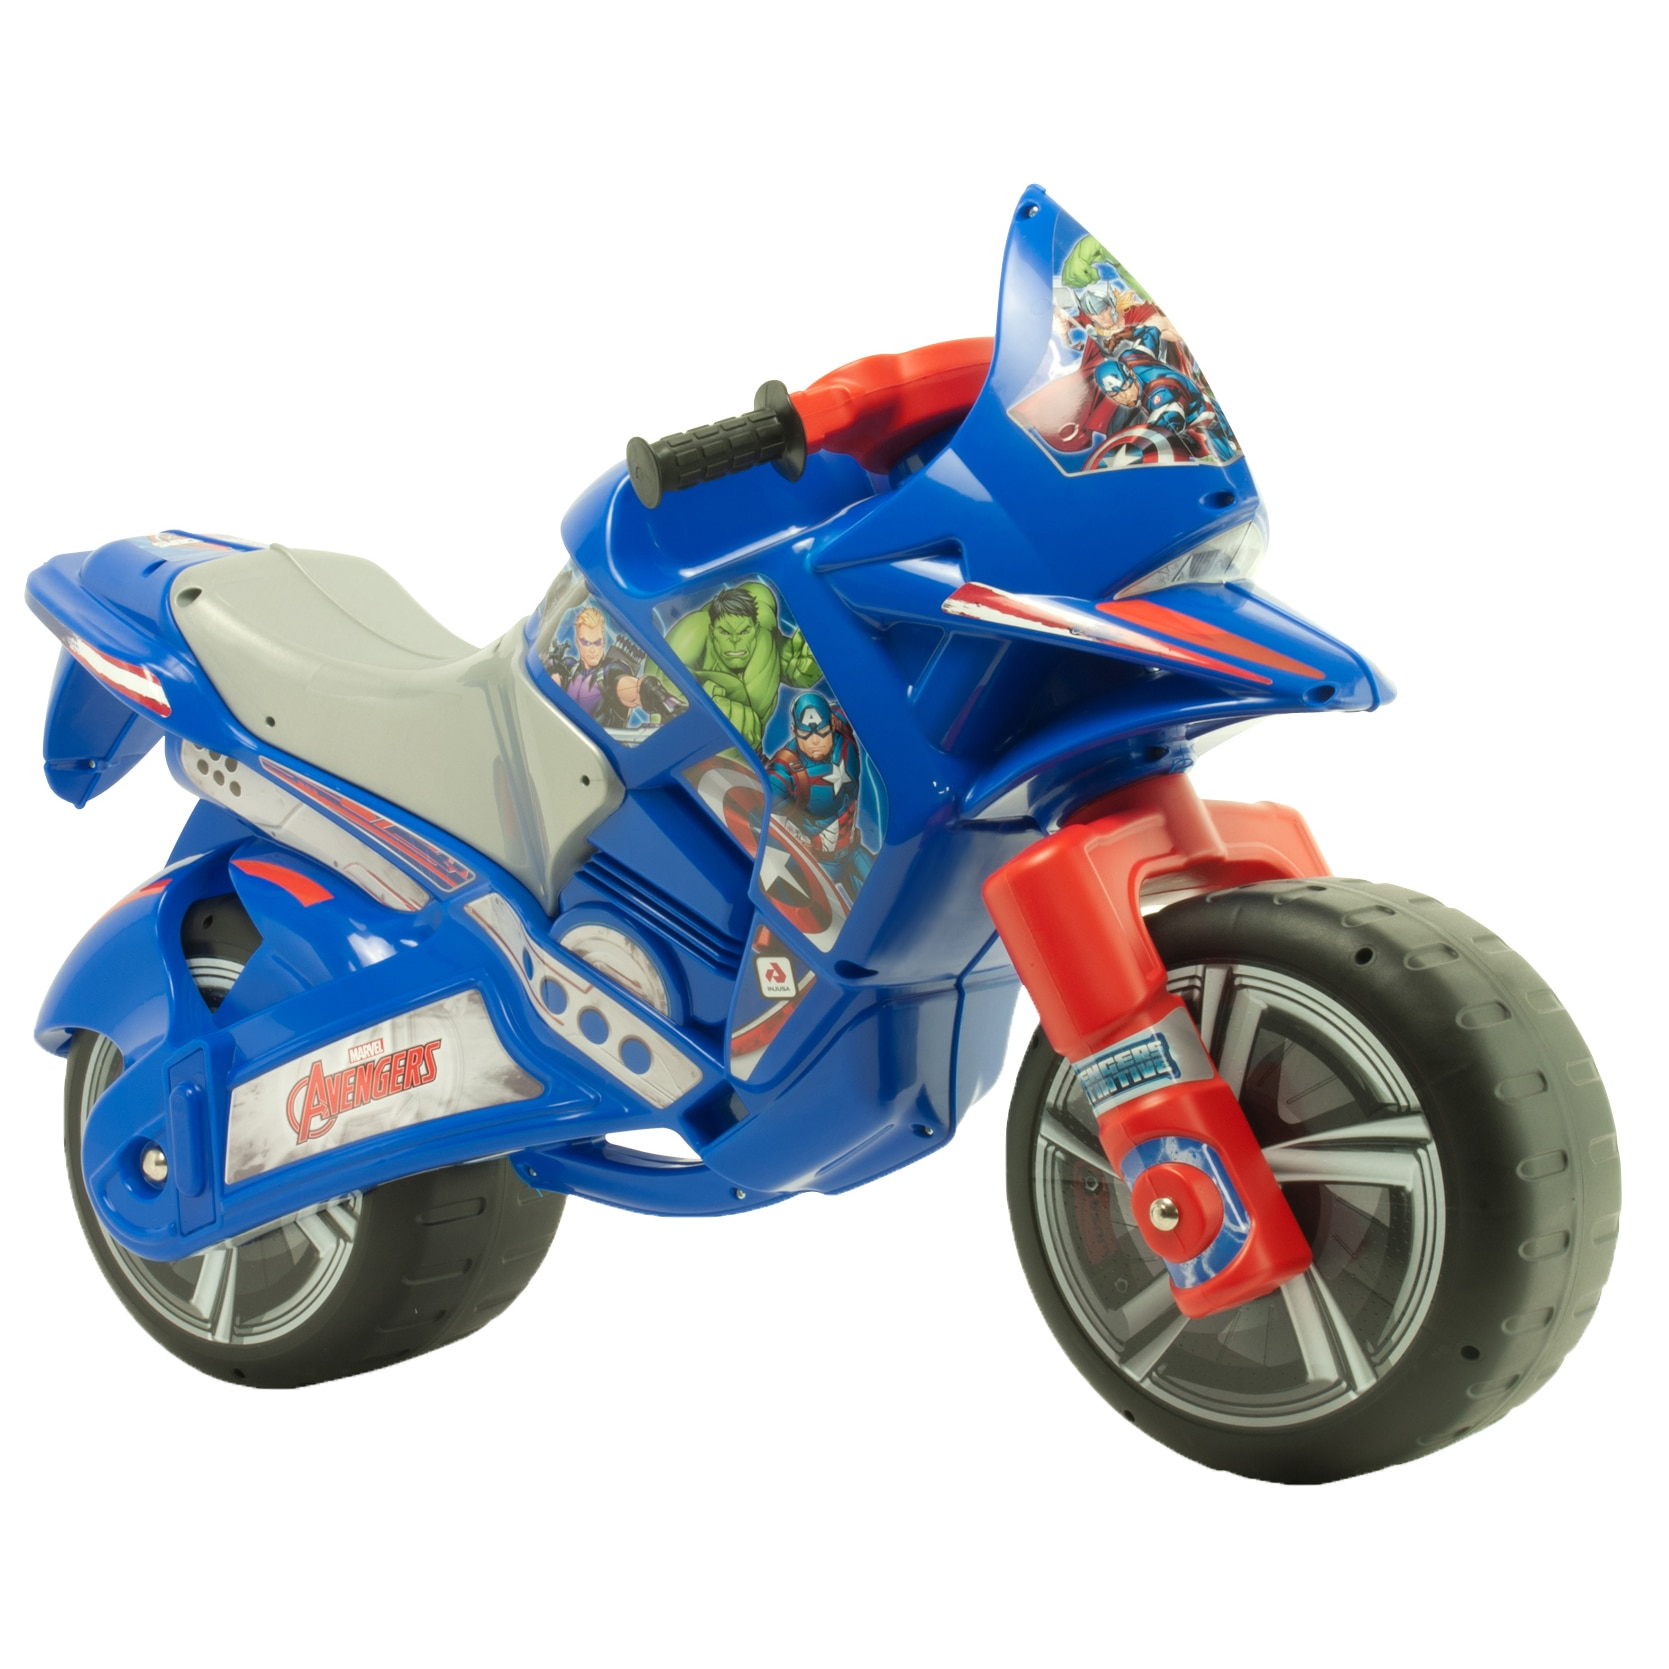 Fotografie Motocicleta Ride-on Injusa - Avengers, albastru